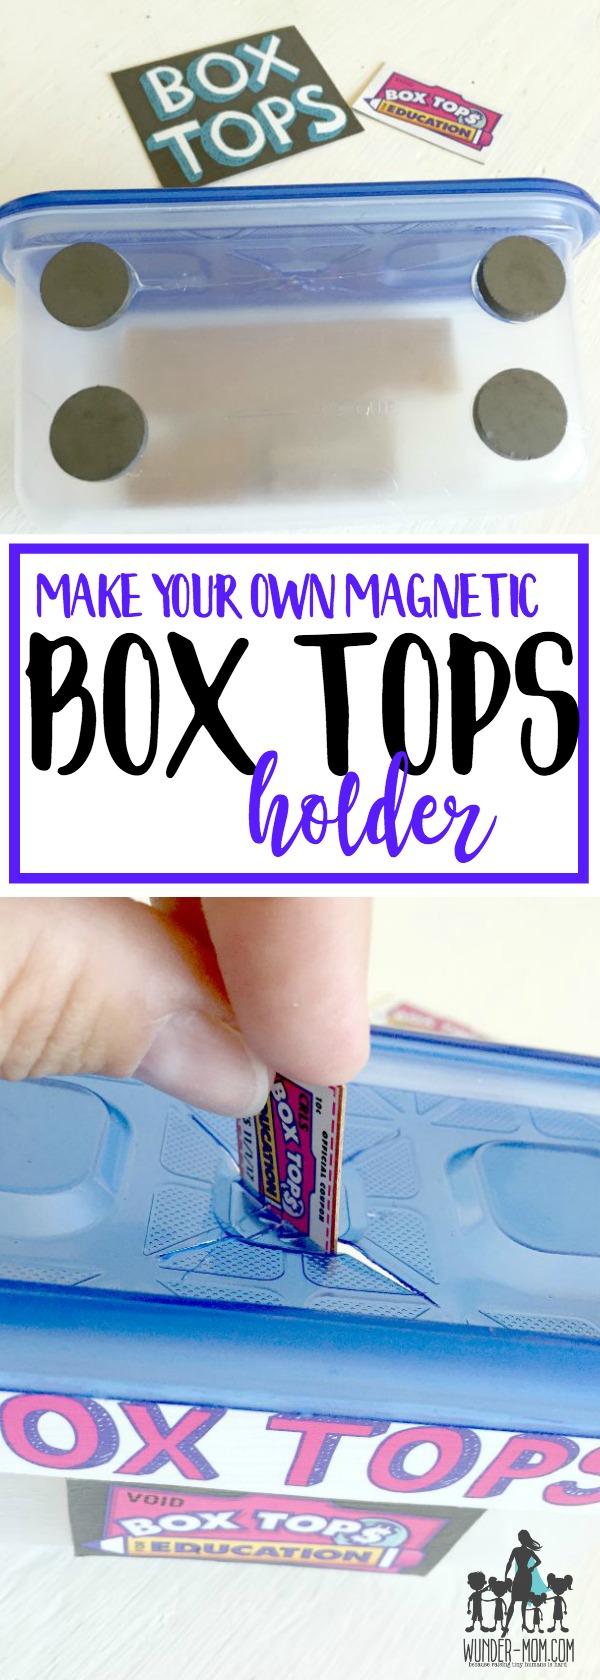 BOX TOPS HOLDER